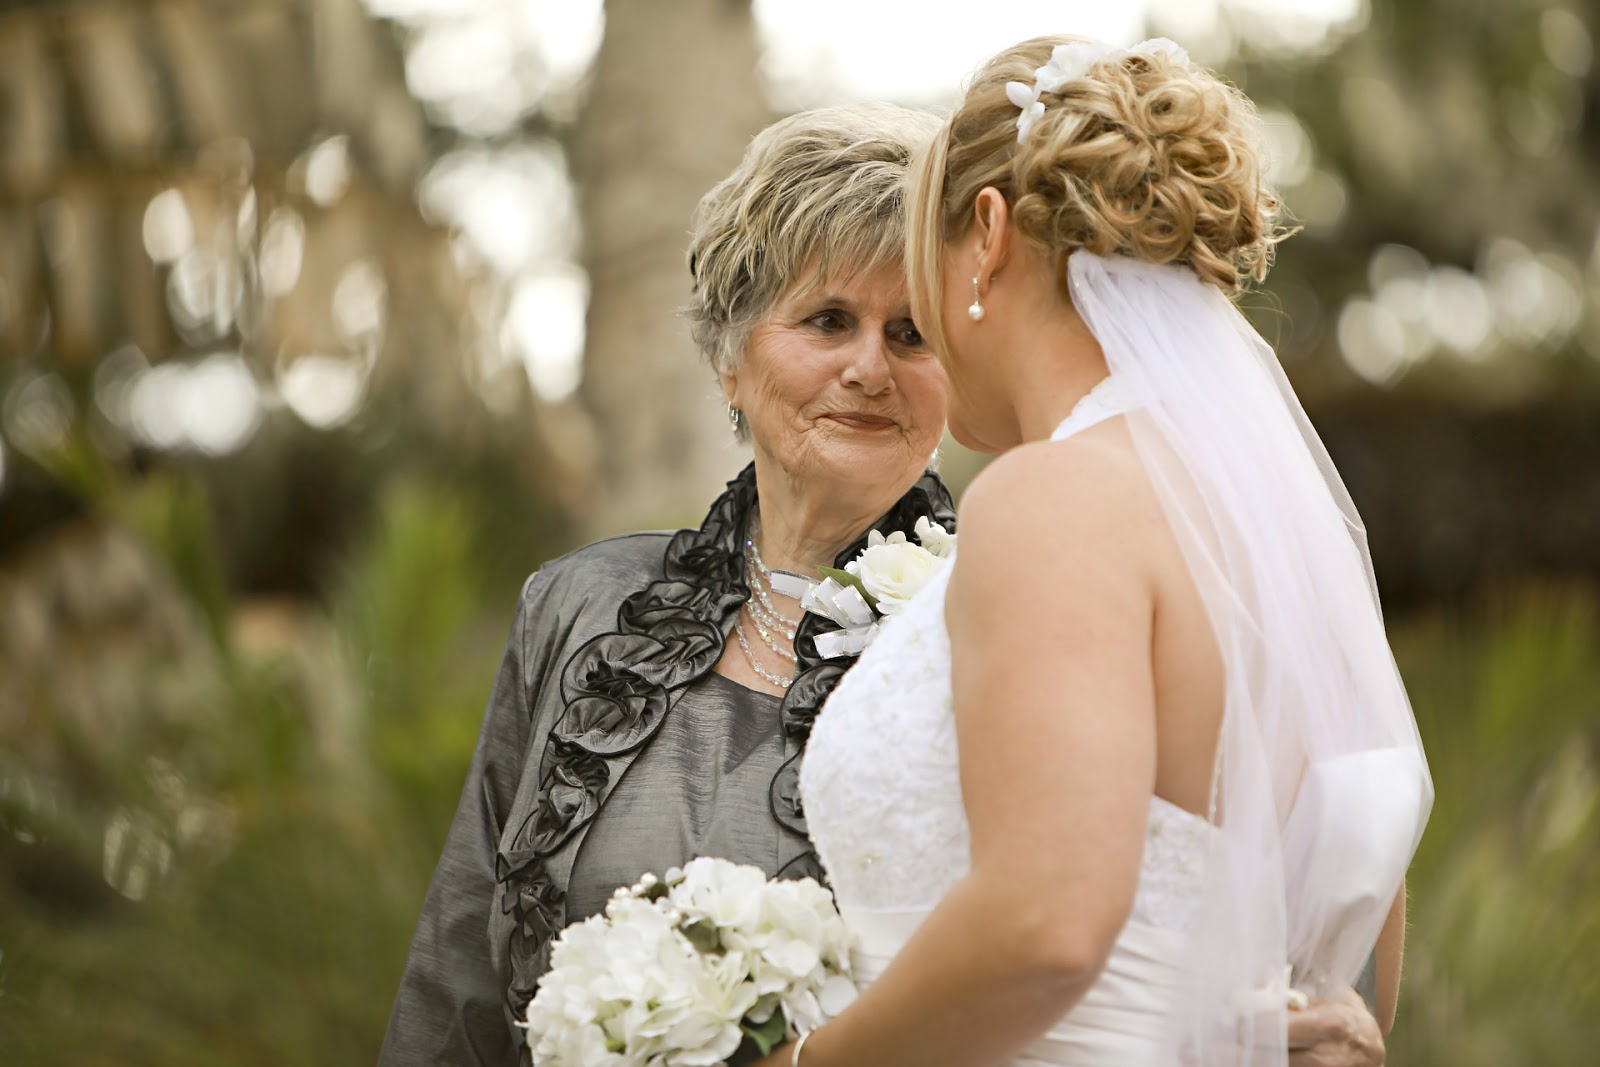 Faktor yang Mempengaruhi Restu Orang Tua